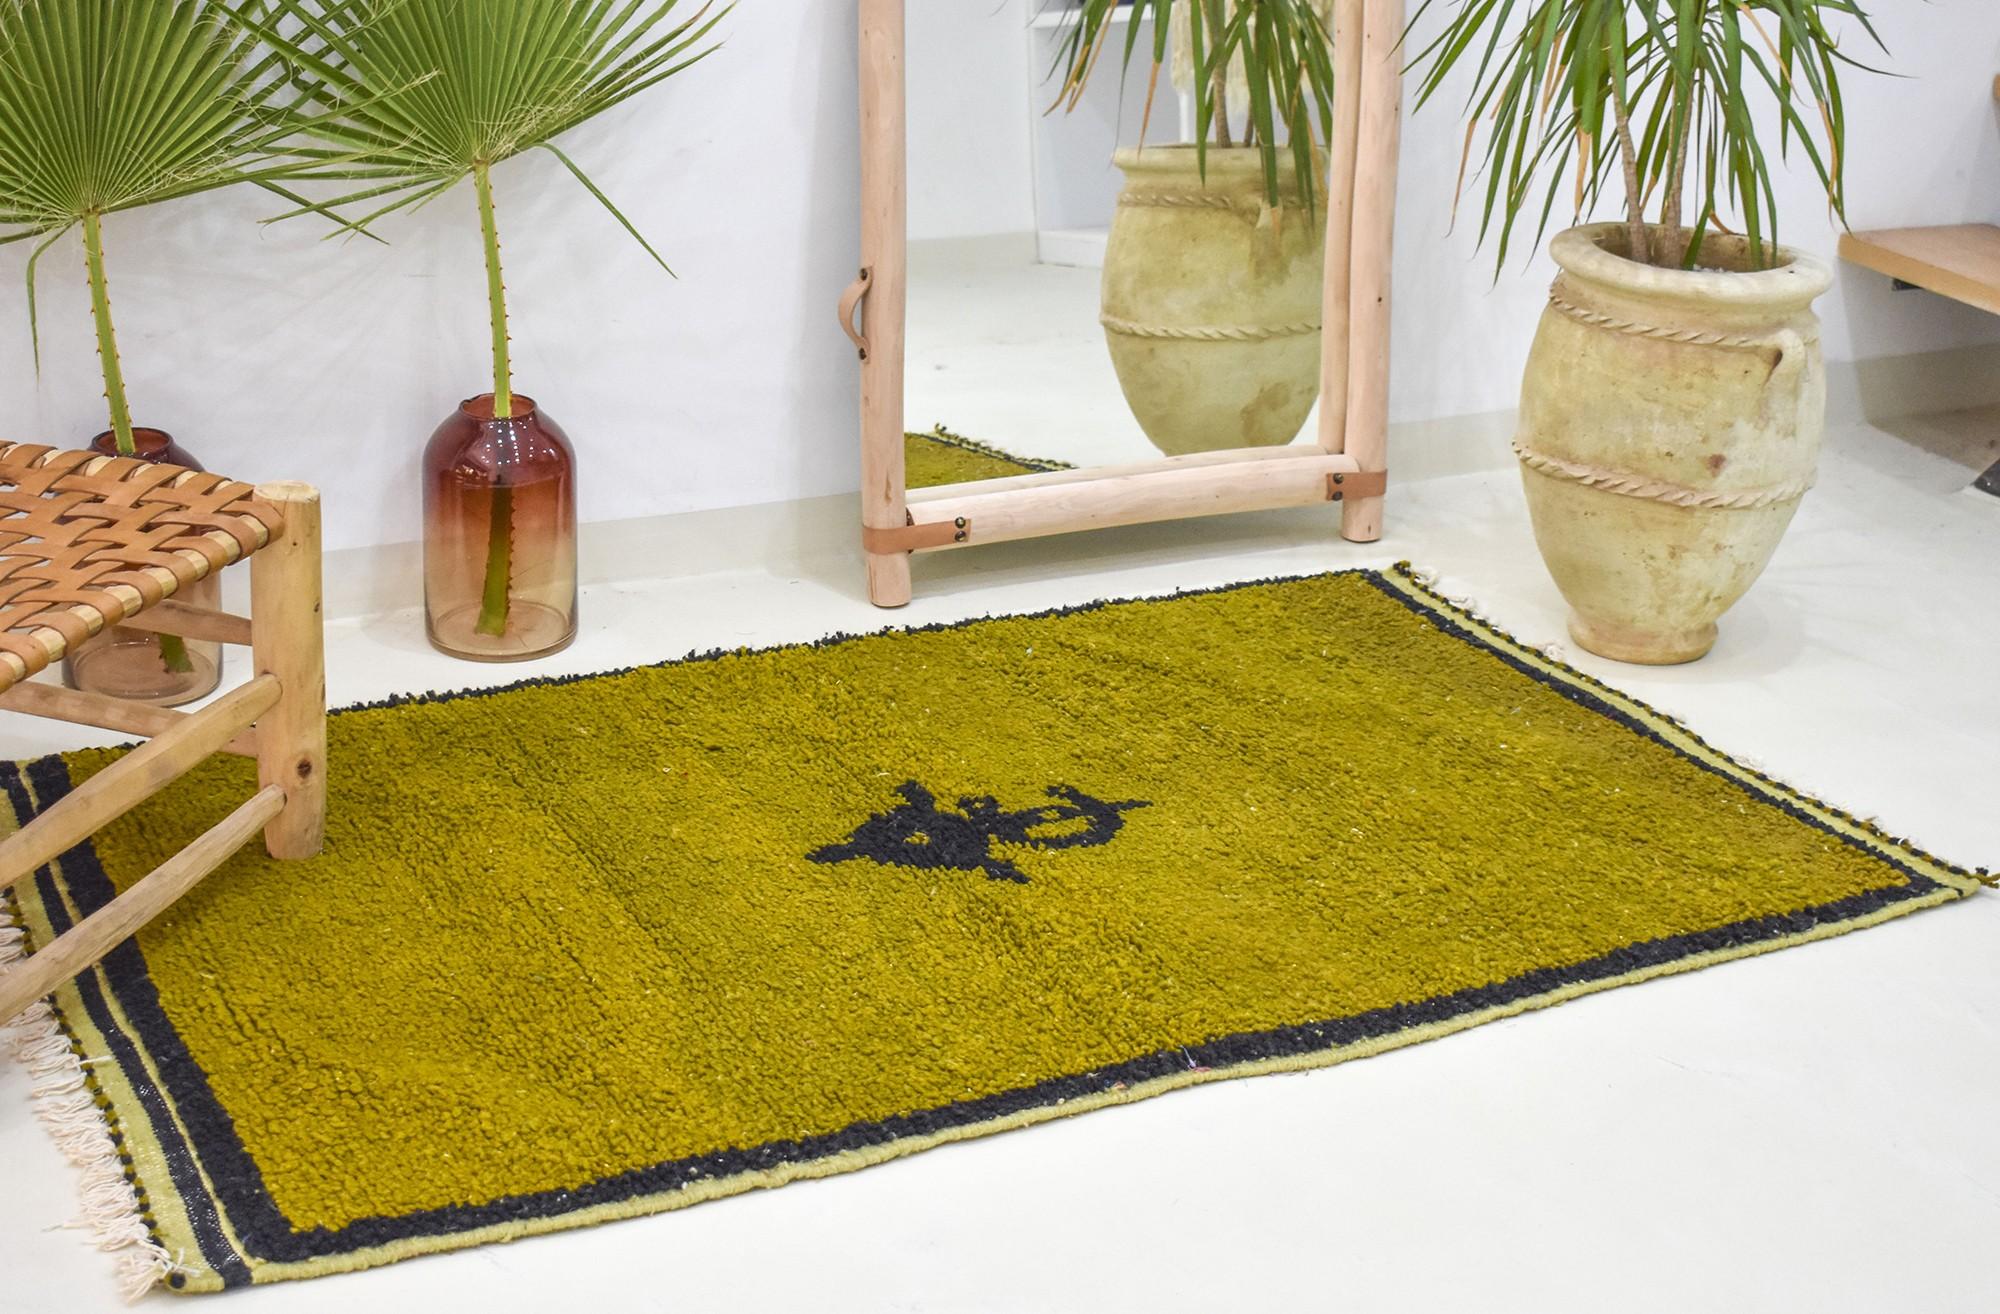 Berber carpet pistachio green with Berber pattern